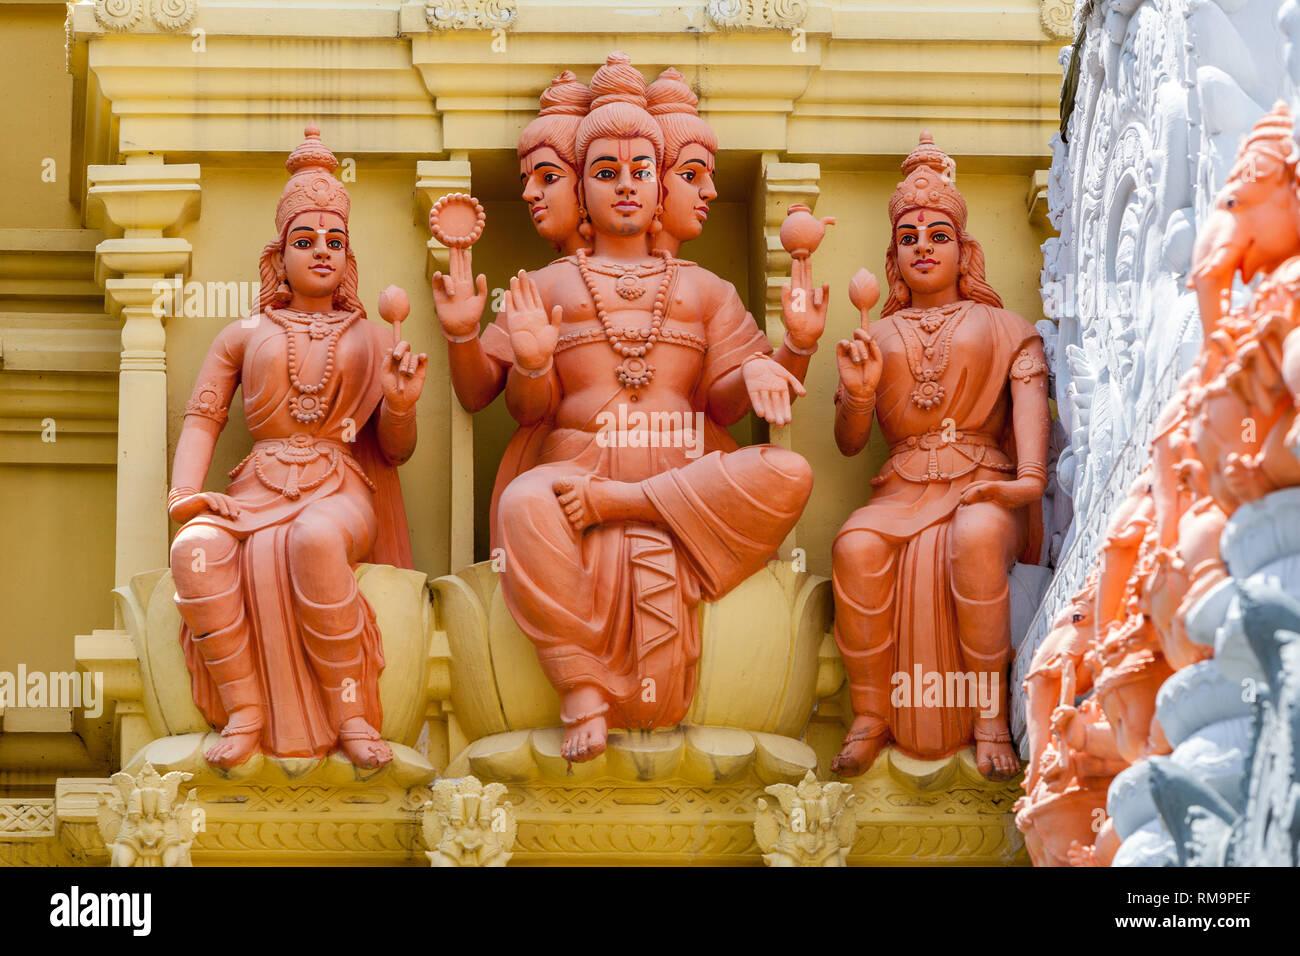 Hindu Deities outside Entrance to Sri Senpaga Vinayagar Hindu Ganesh Temple, Joo Chiat District, Singapore. - Stock Image